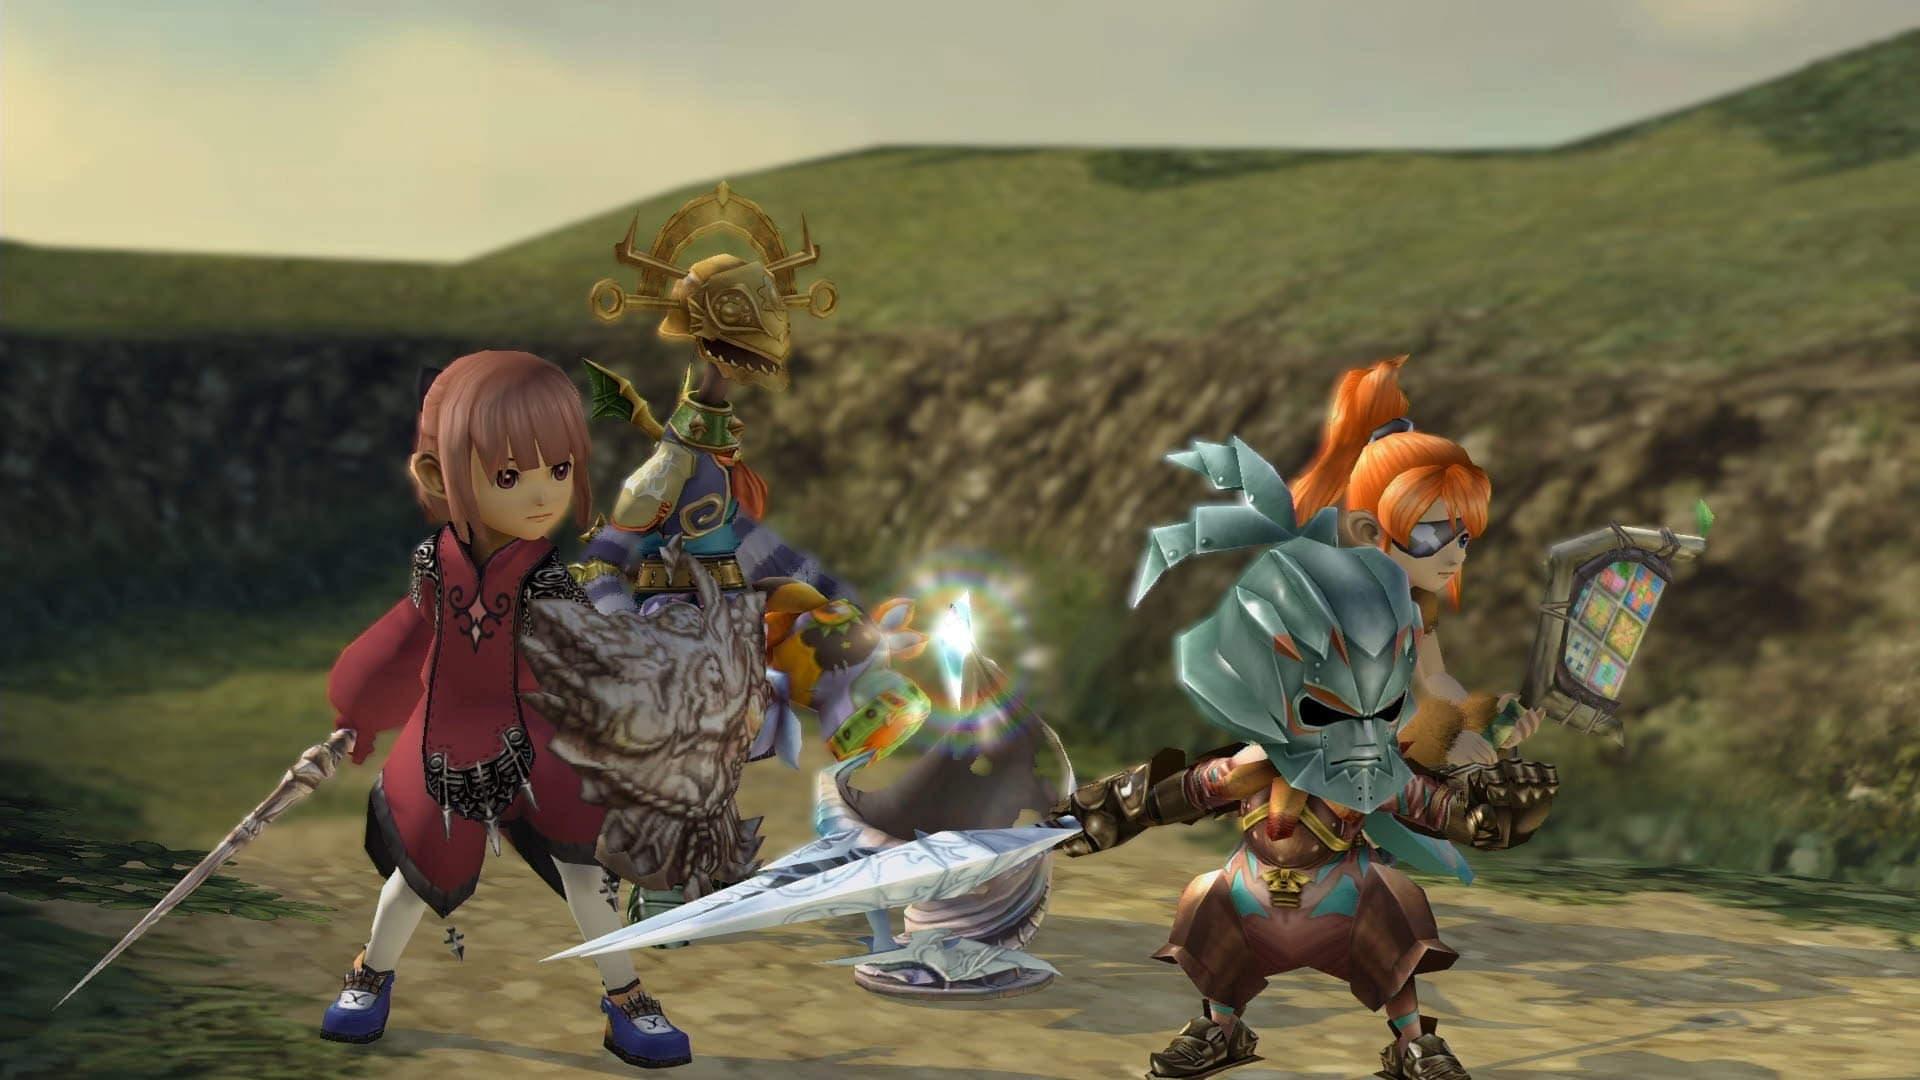 Le Réalisateur De Final Fantasy Crystal Chronicles Remastered Edition S'excuse